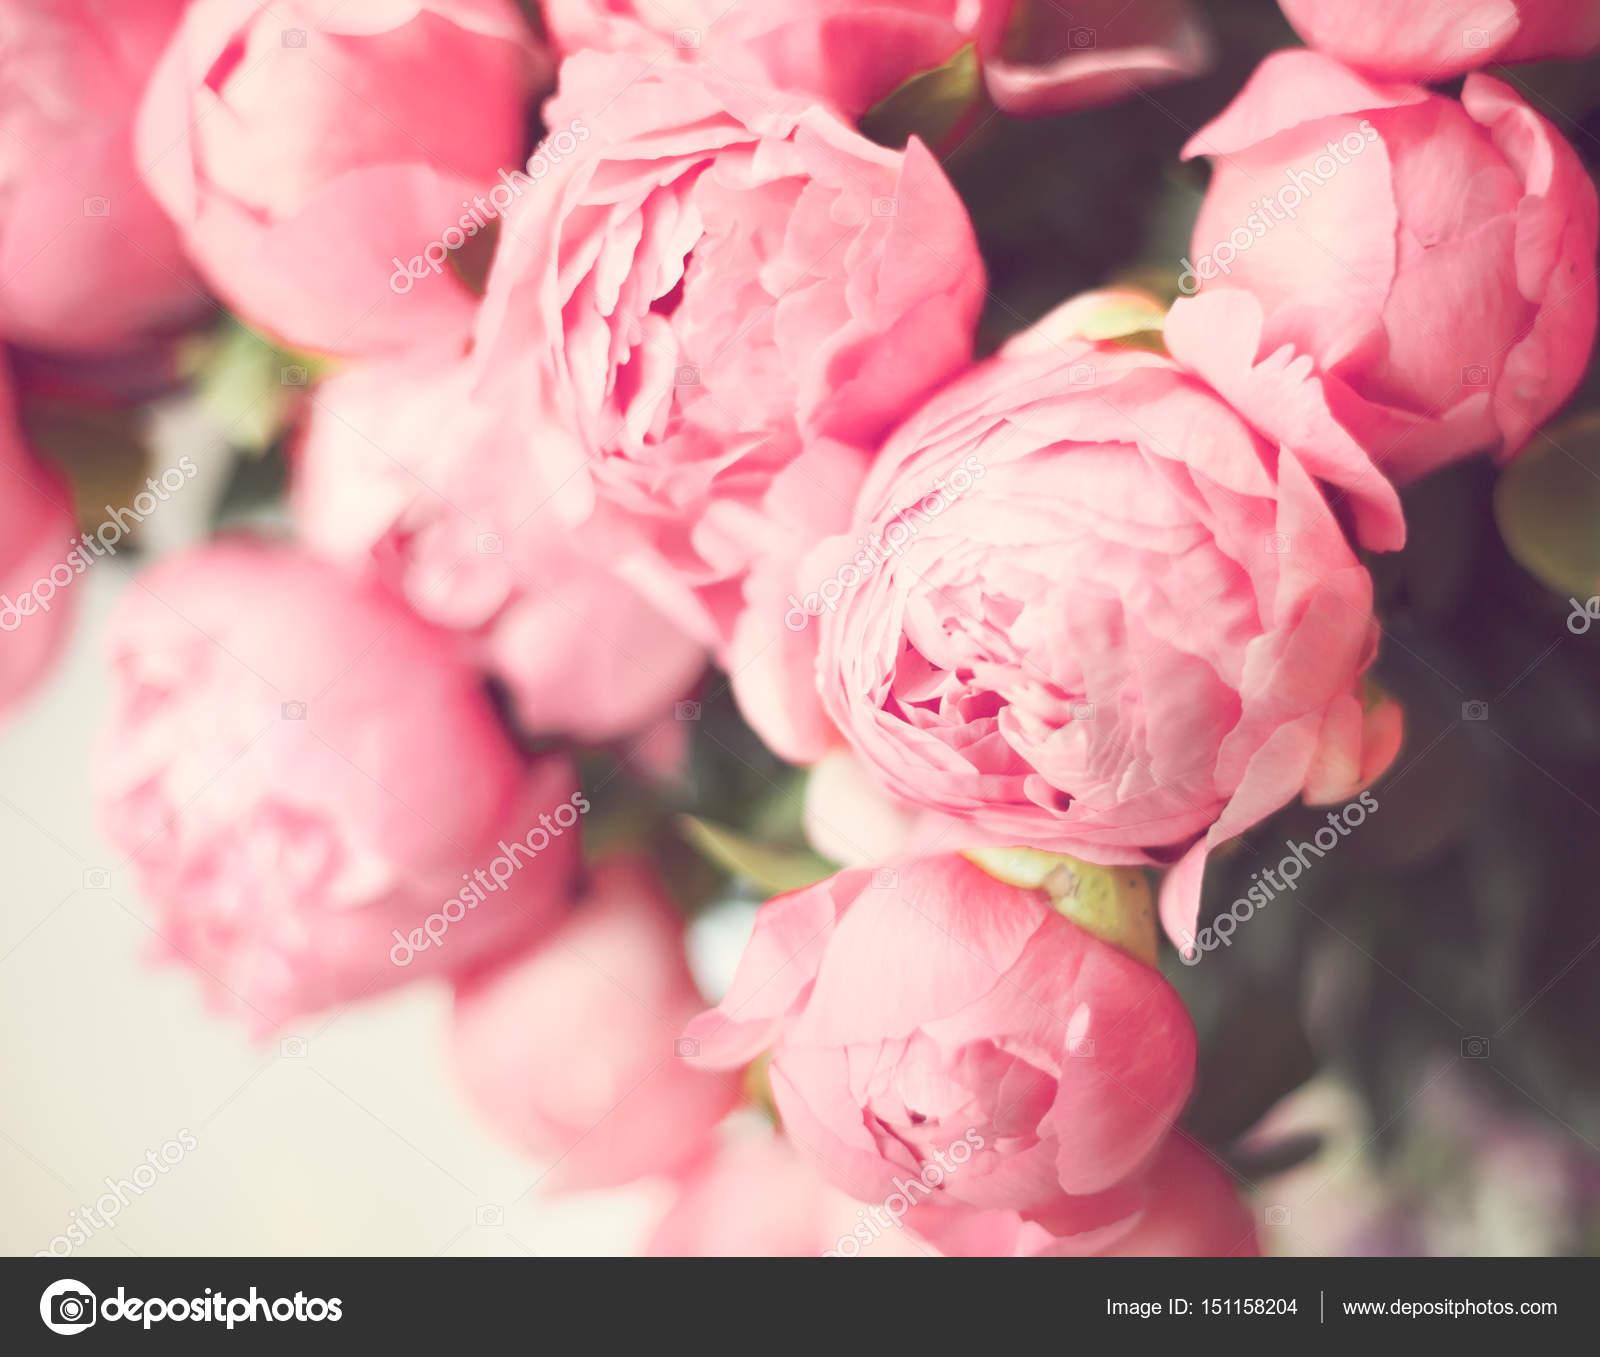 Vintage Rosa Pfingstrosen Stockfoto C Andrekaphoto 151158204